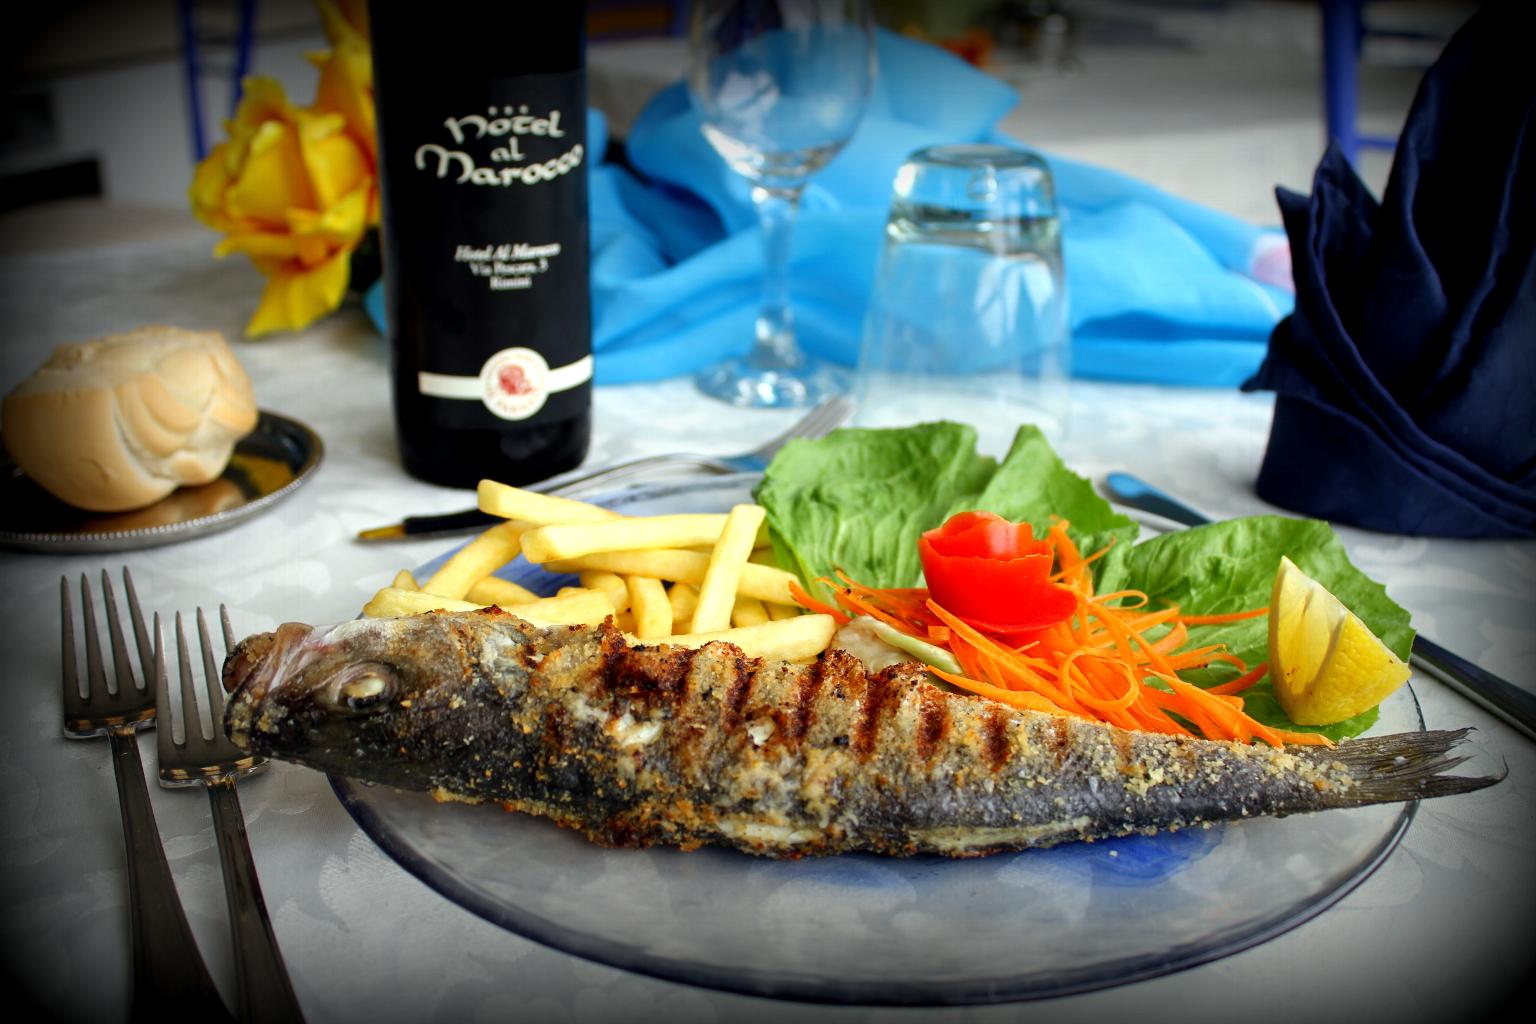 Ordyten piastrelle cucina rettangolari vendita cucine - Progetta cucina ikea ...